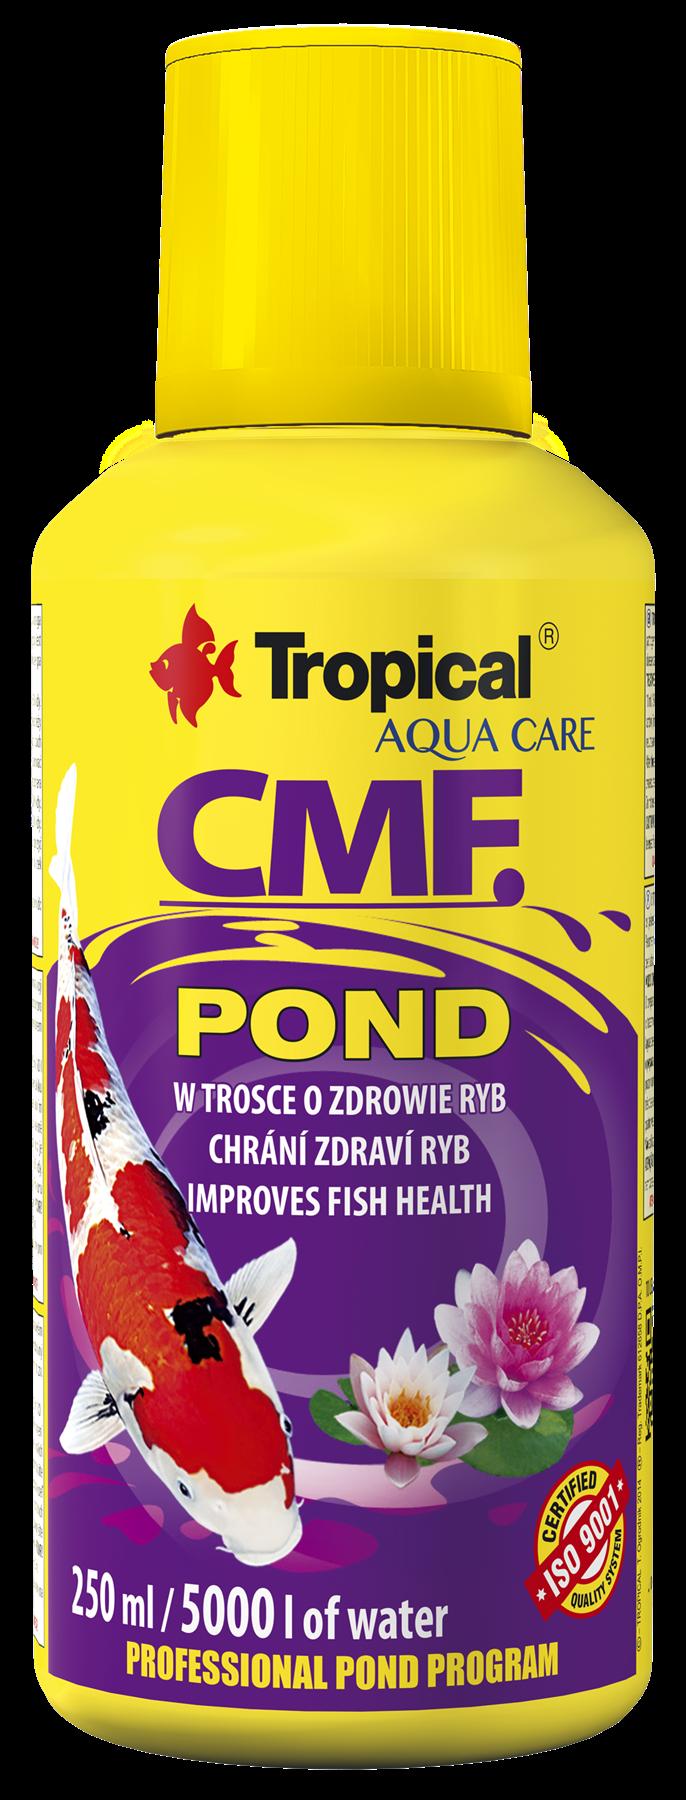 CMF POND